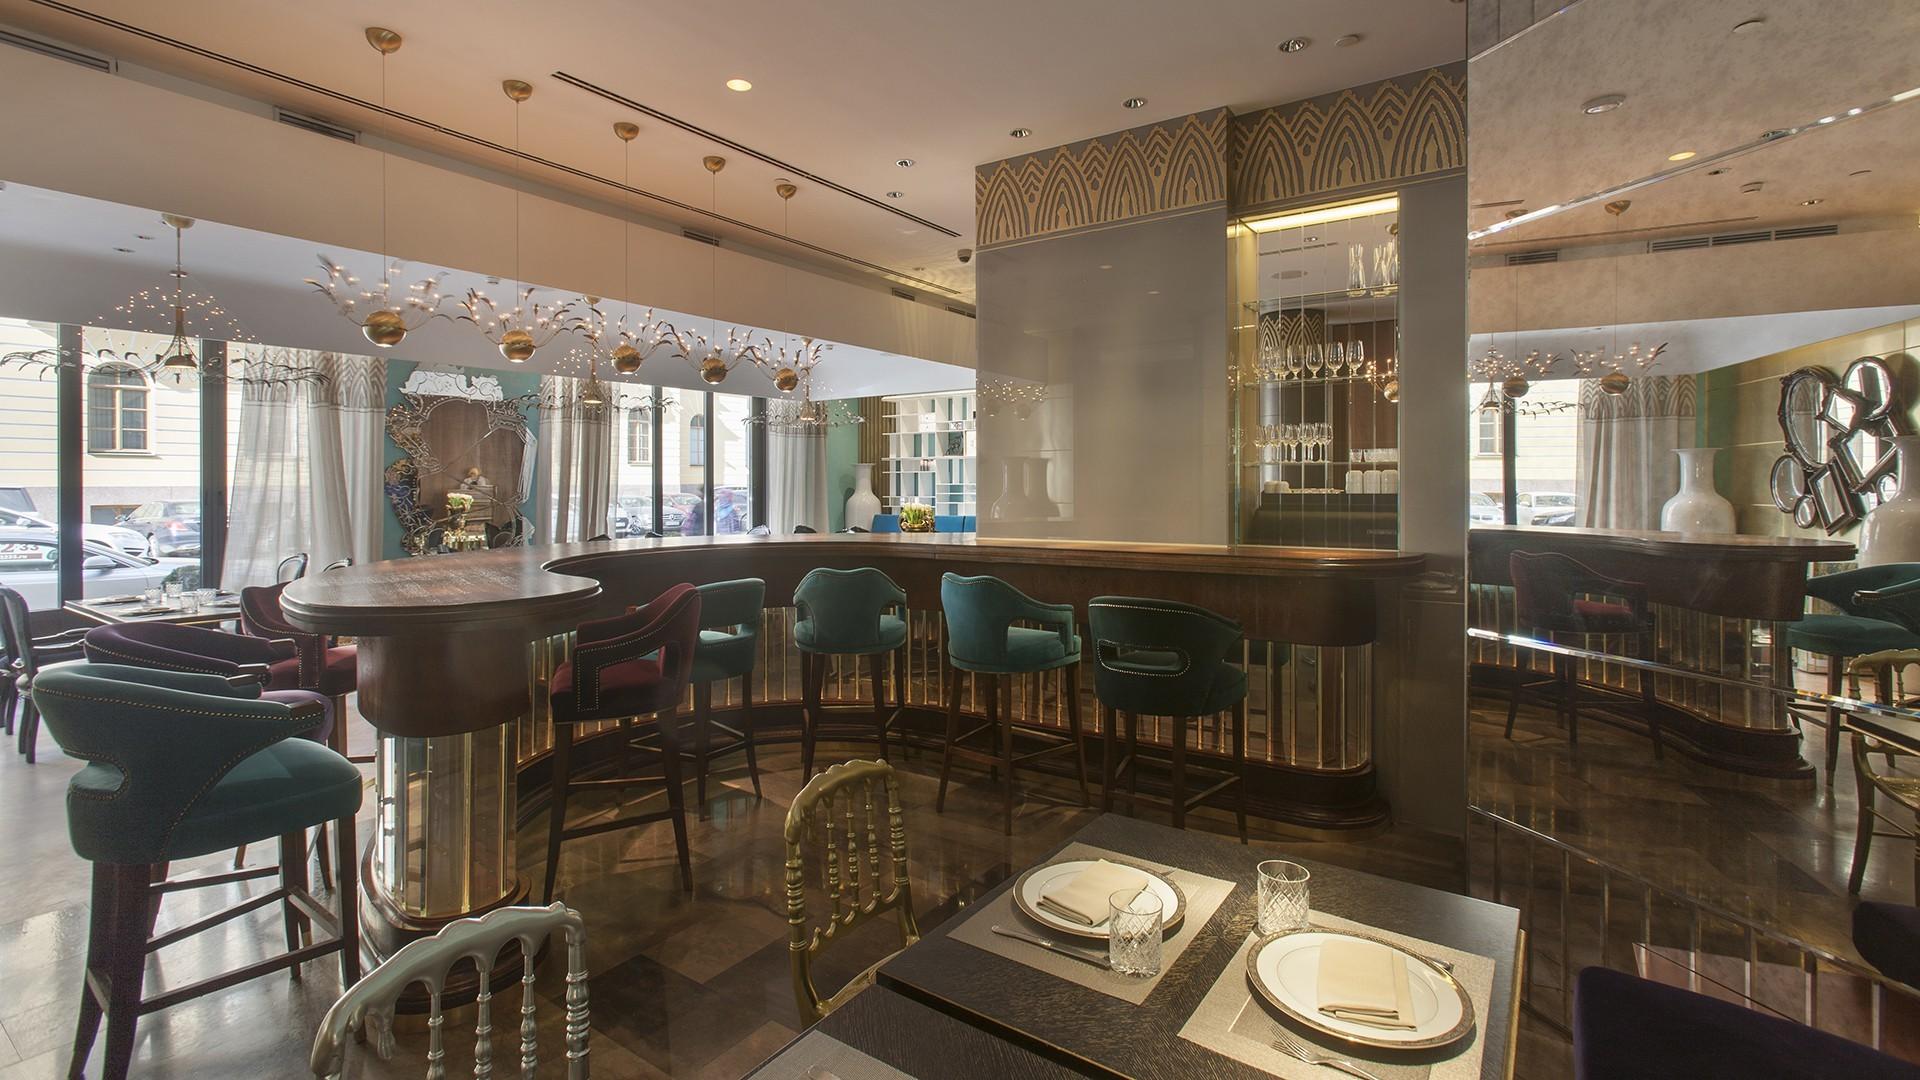 Restaurant Kokoko in Petersburg: menu, photo, address and reviews 38